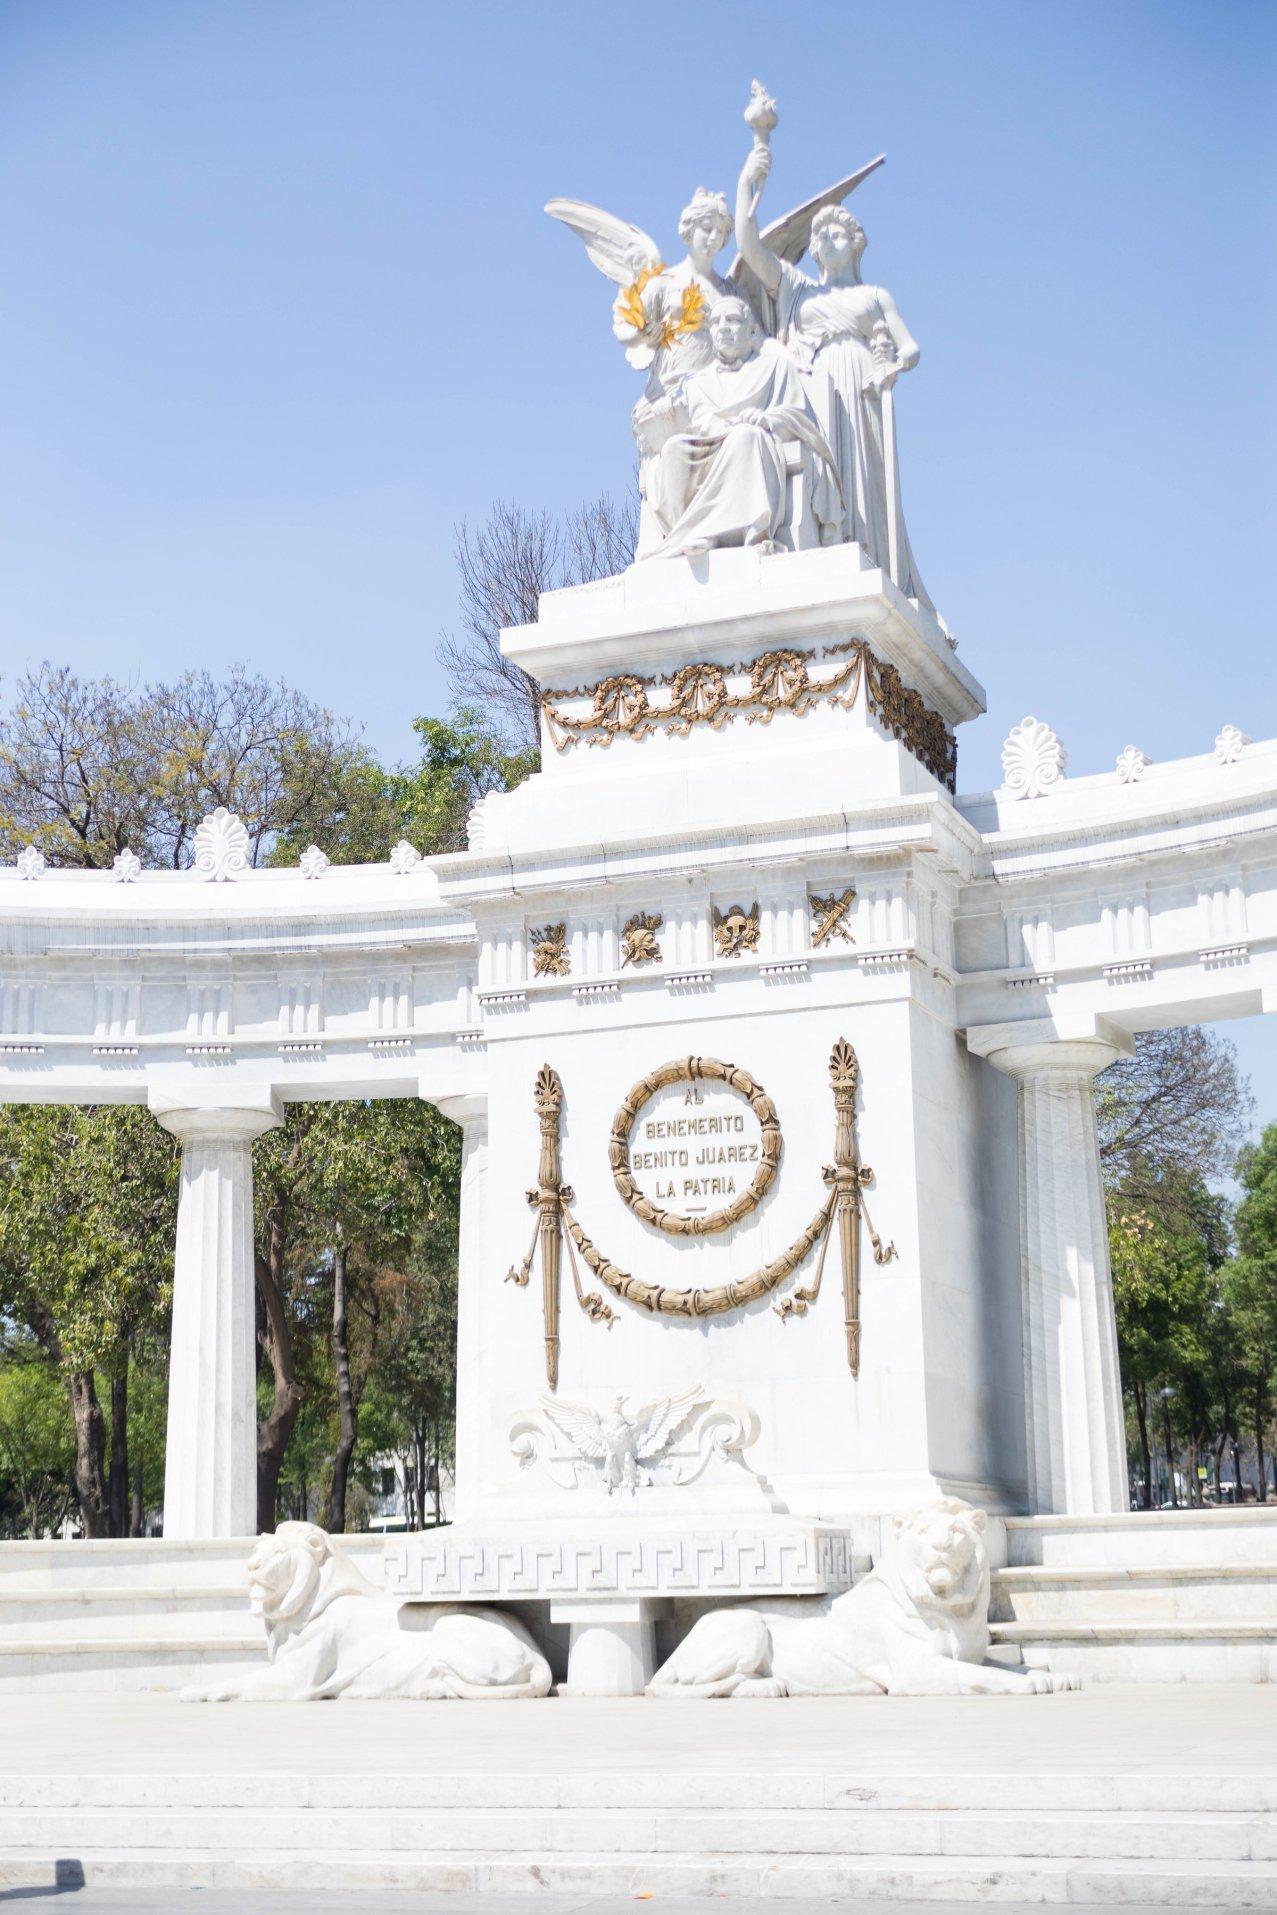 Monument to Benito Juarez Hemiciclo de Benito Juarez Mexico City